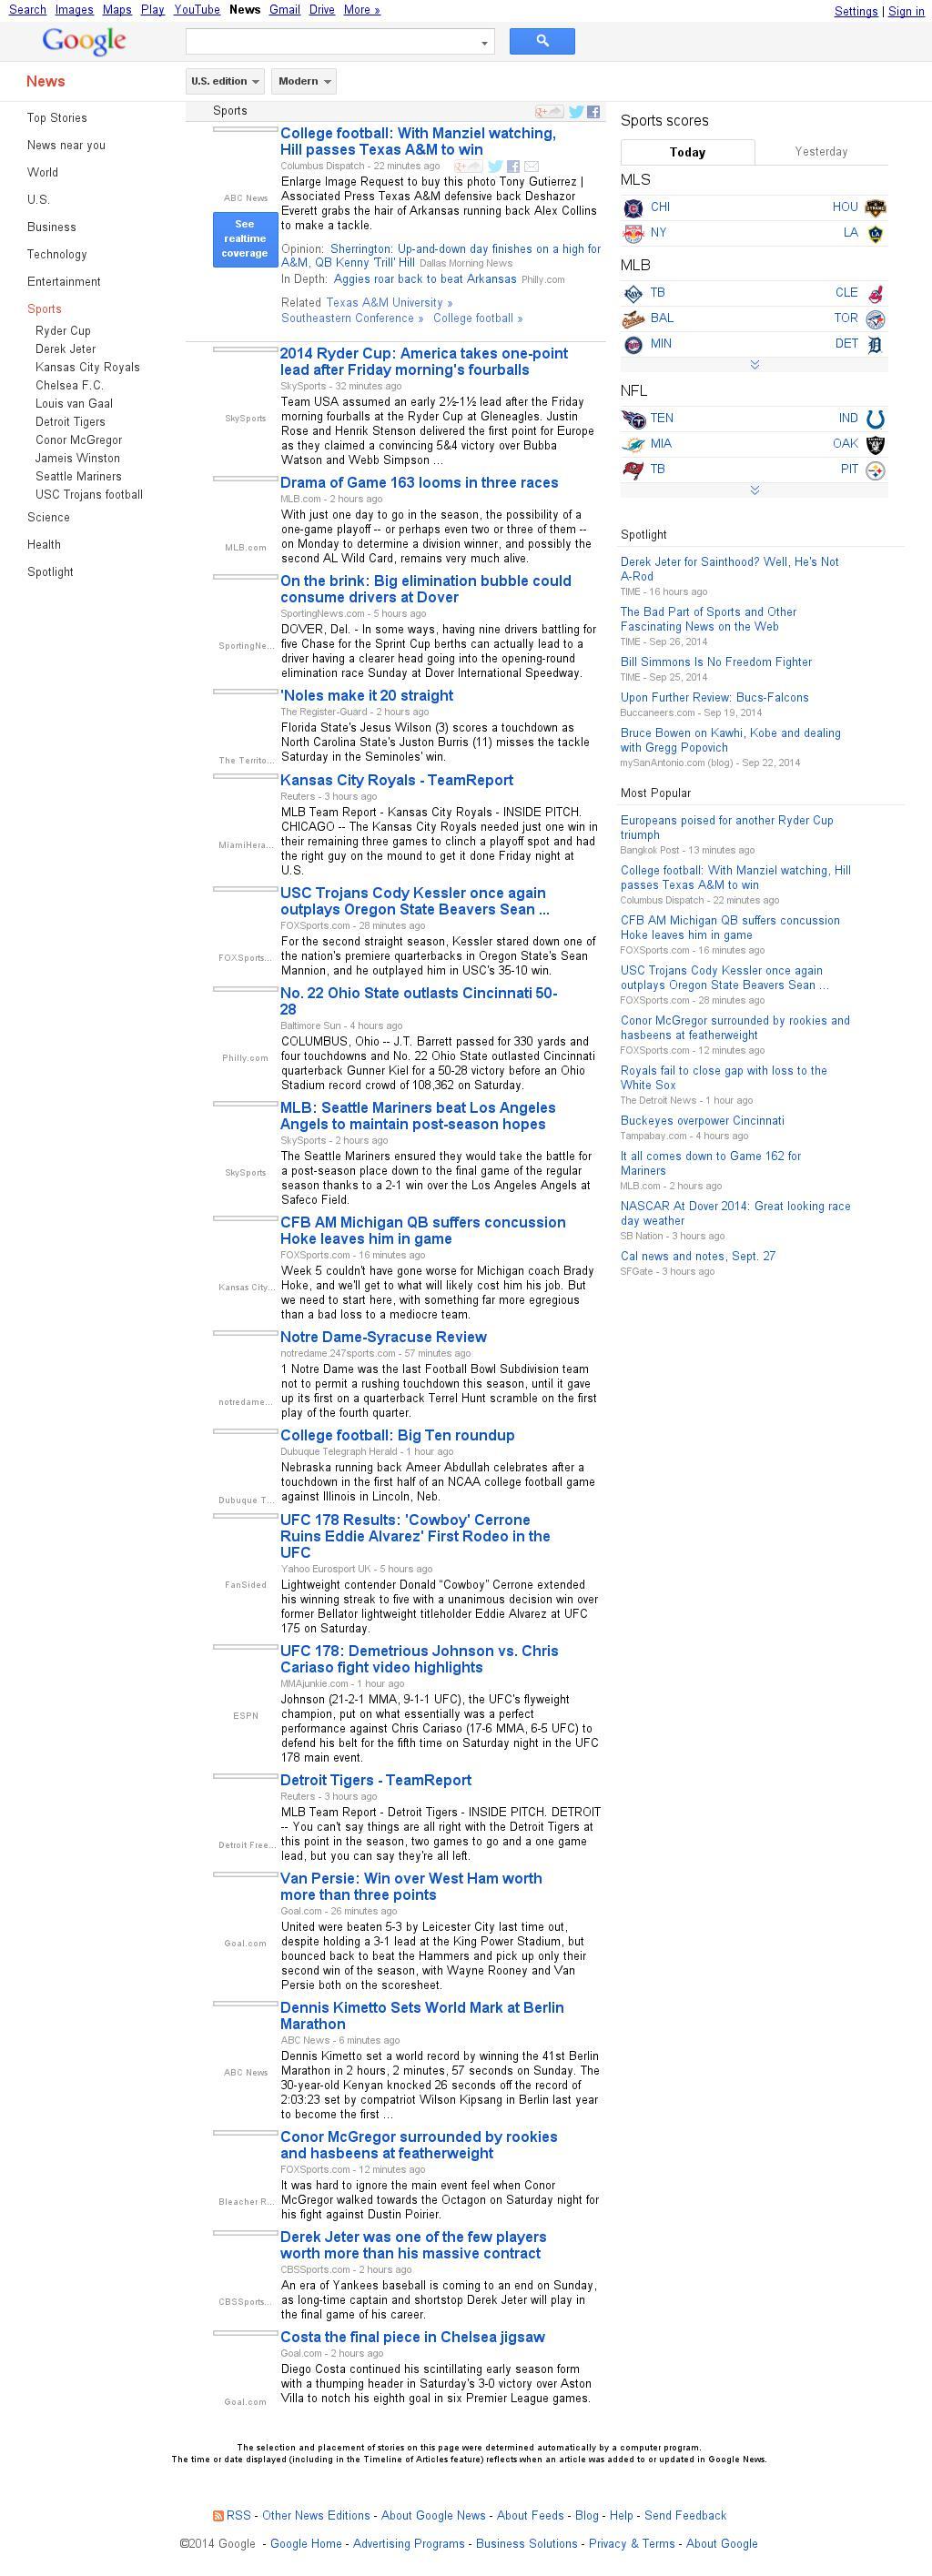 Google News: Sports at Sunday Sept. 28, 2014, 10:06 a.m. UTC